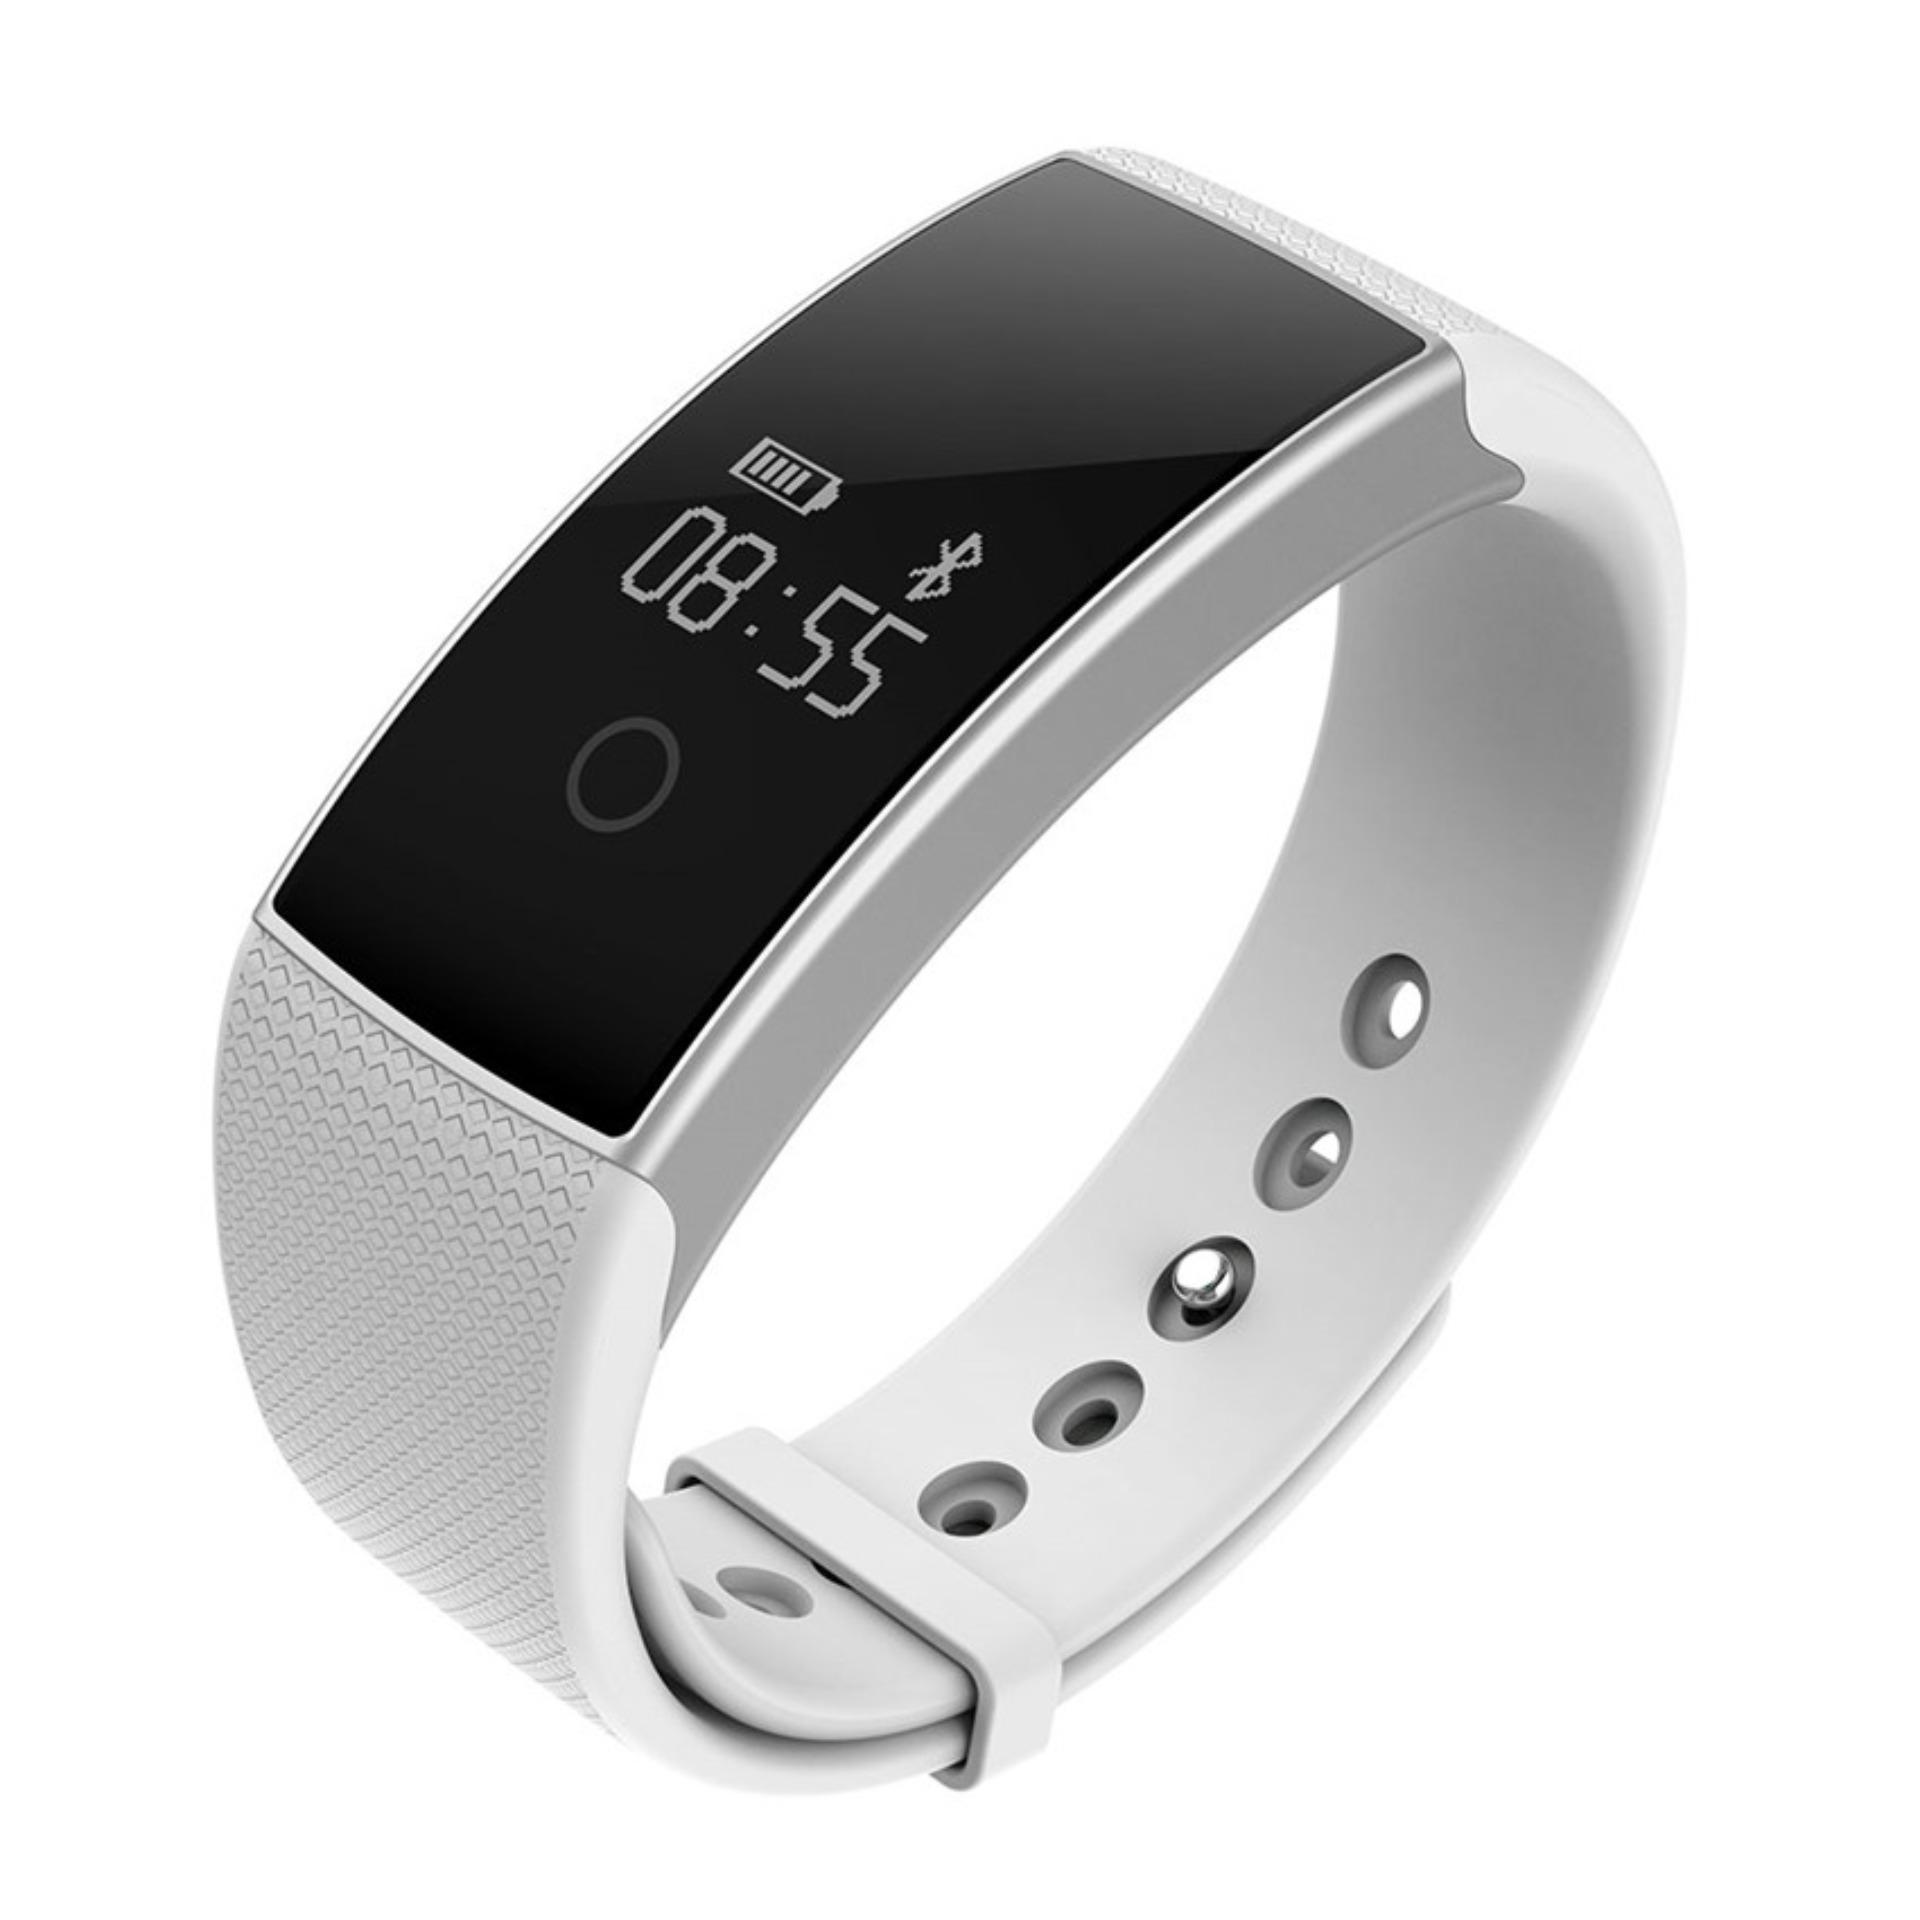 2016 Best Quality TTLIFE A99 smart bracelet heart rate monitor Blood oxygen monitor pedometer bracelet (white)